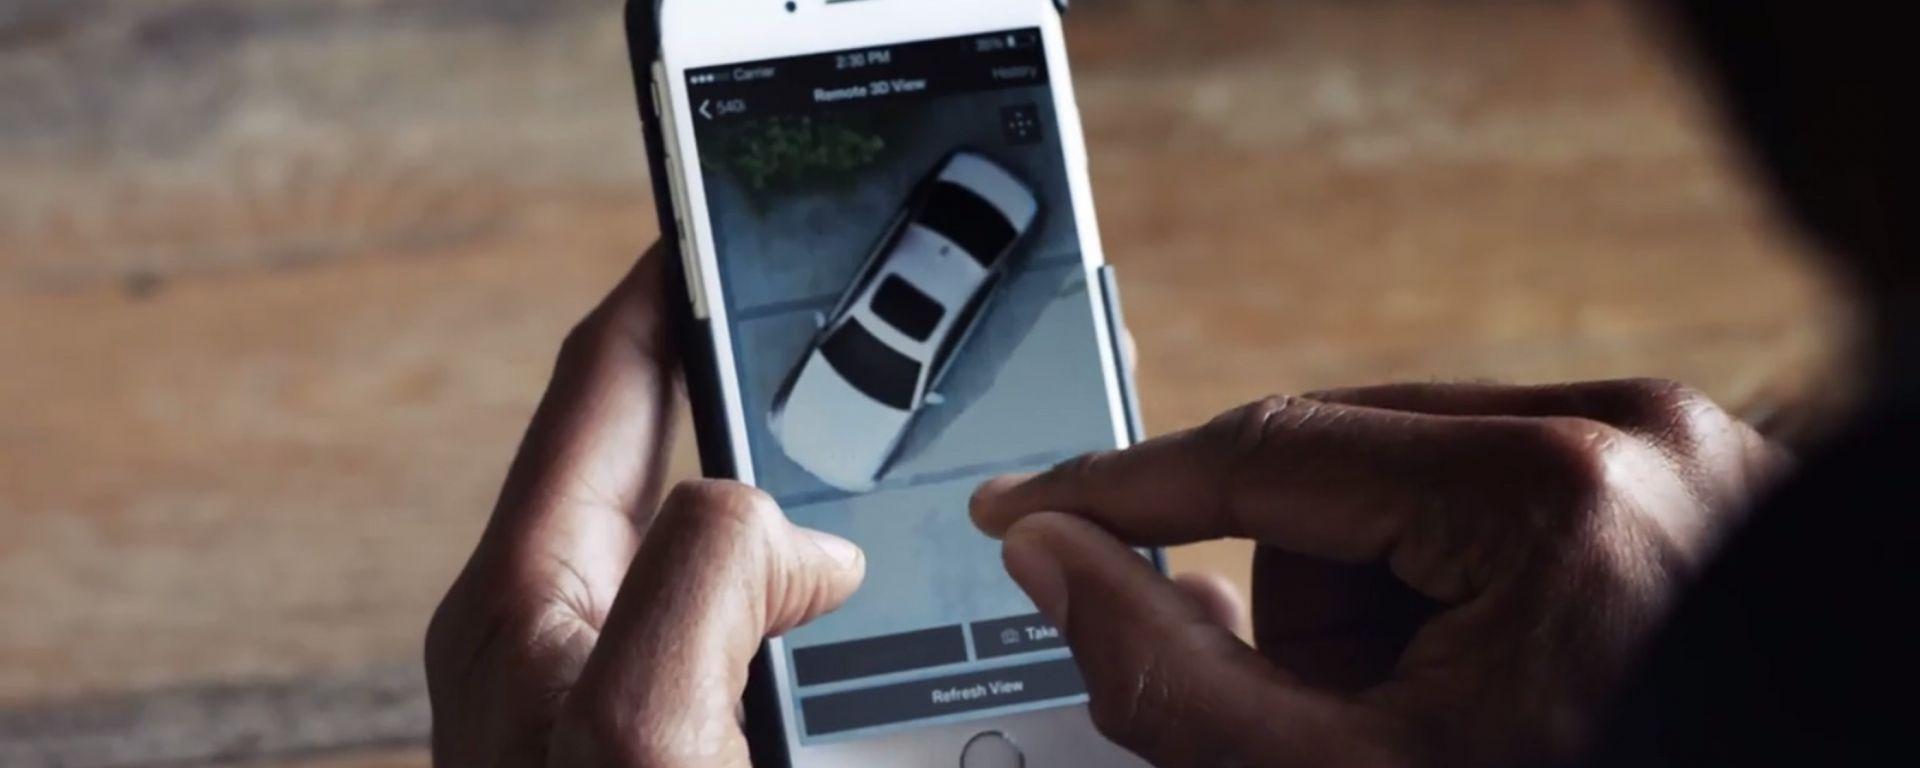 BMW Serie 5: la nuova generazione è in arrivo